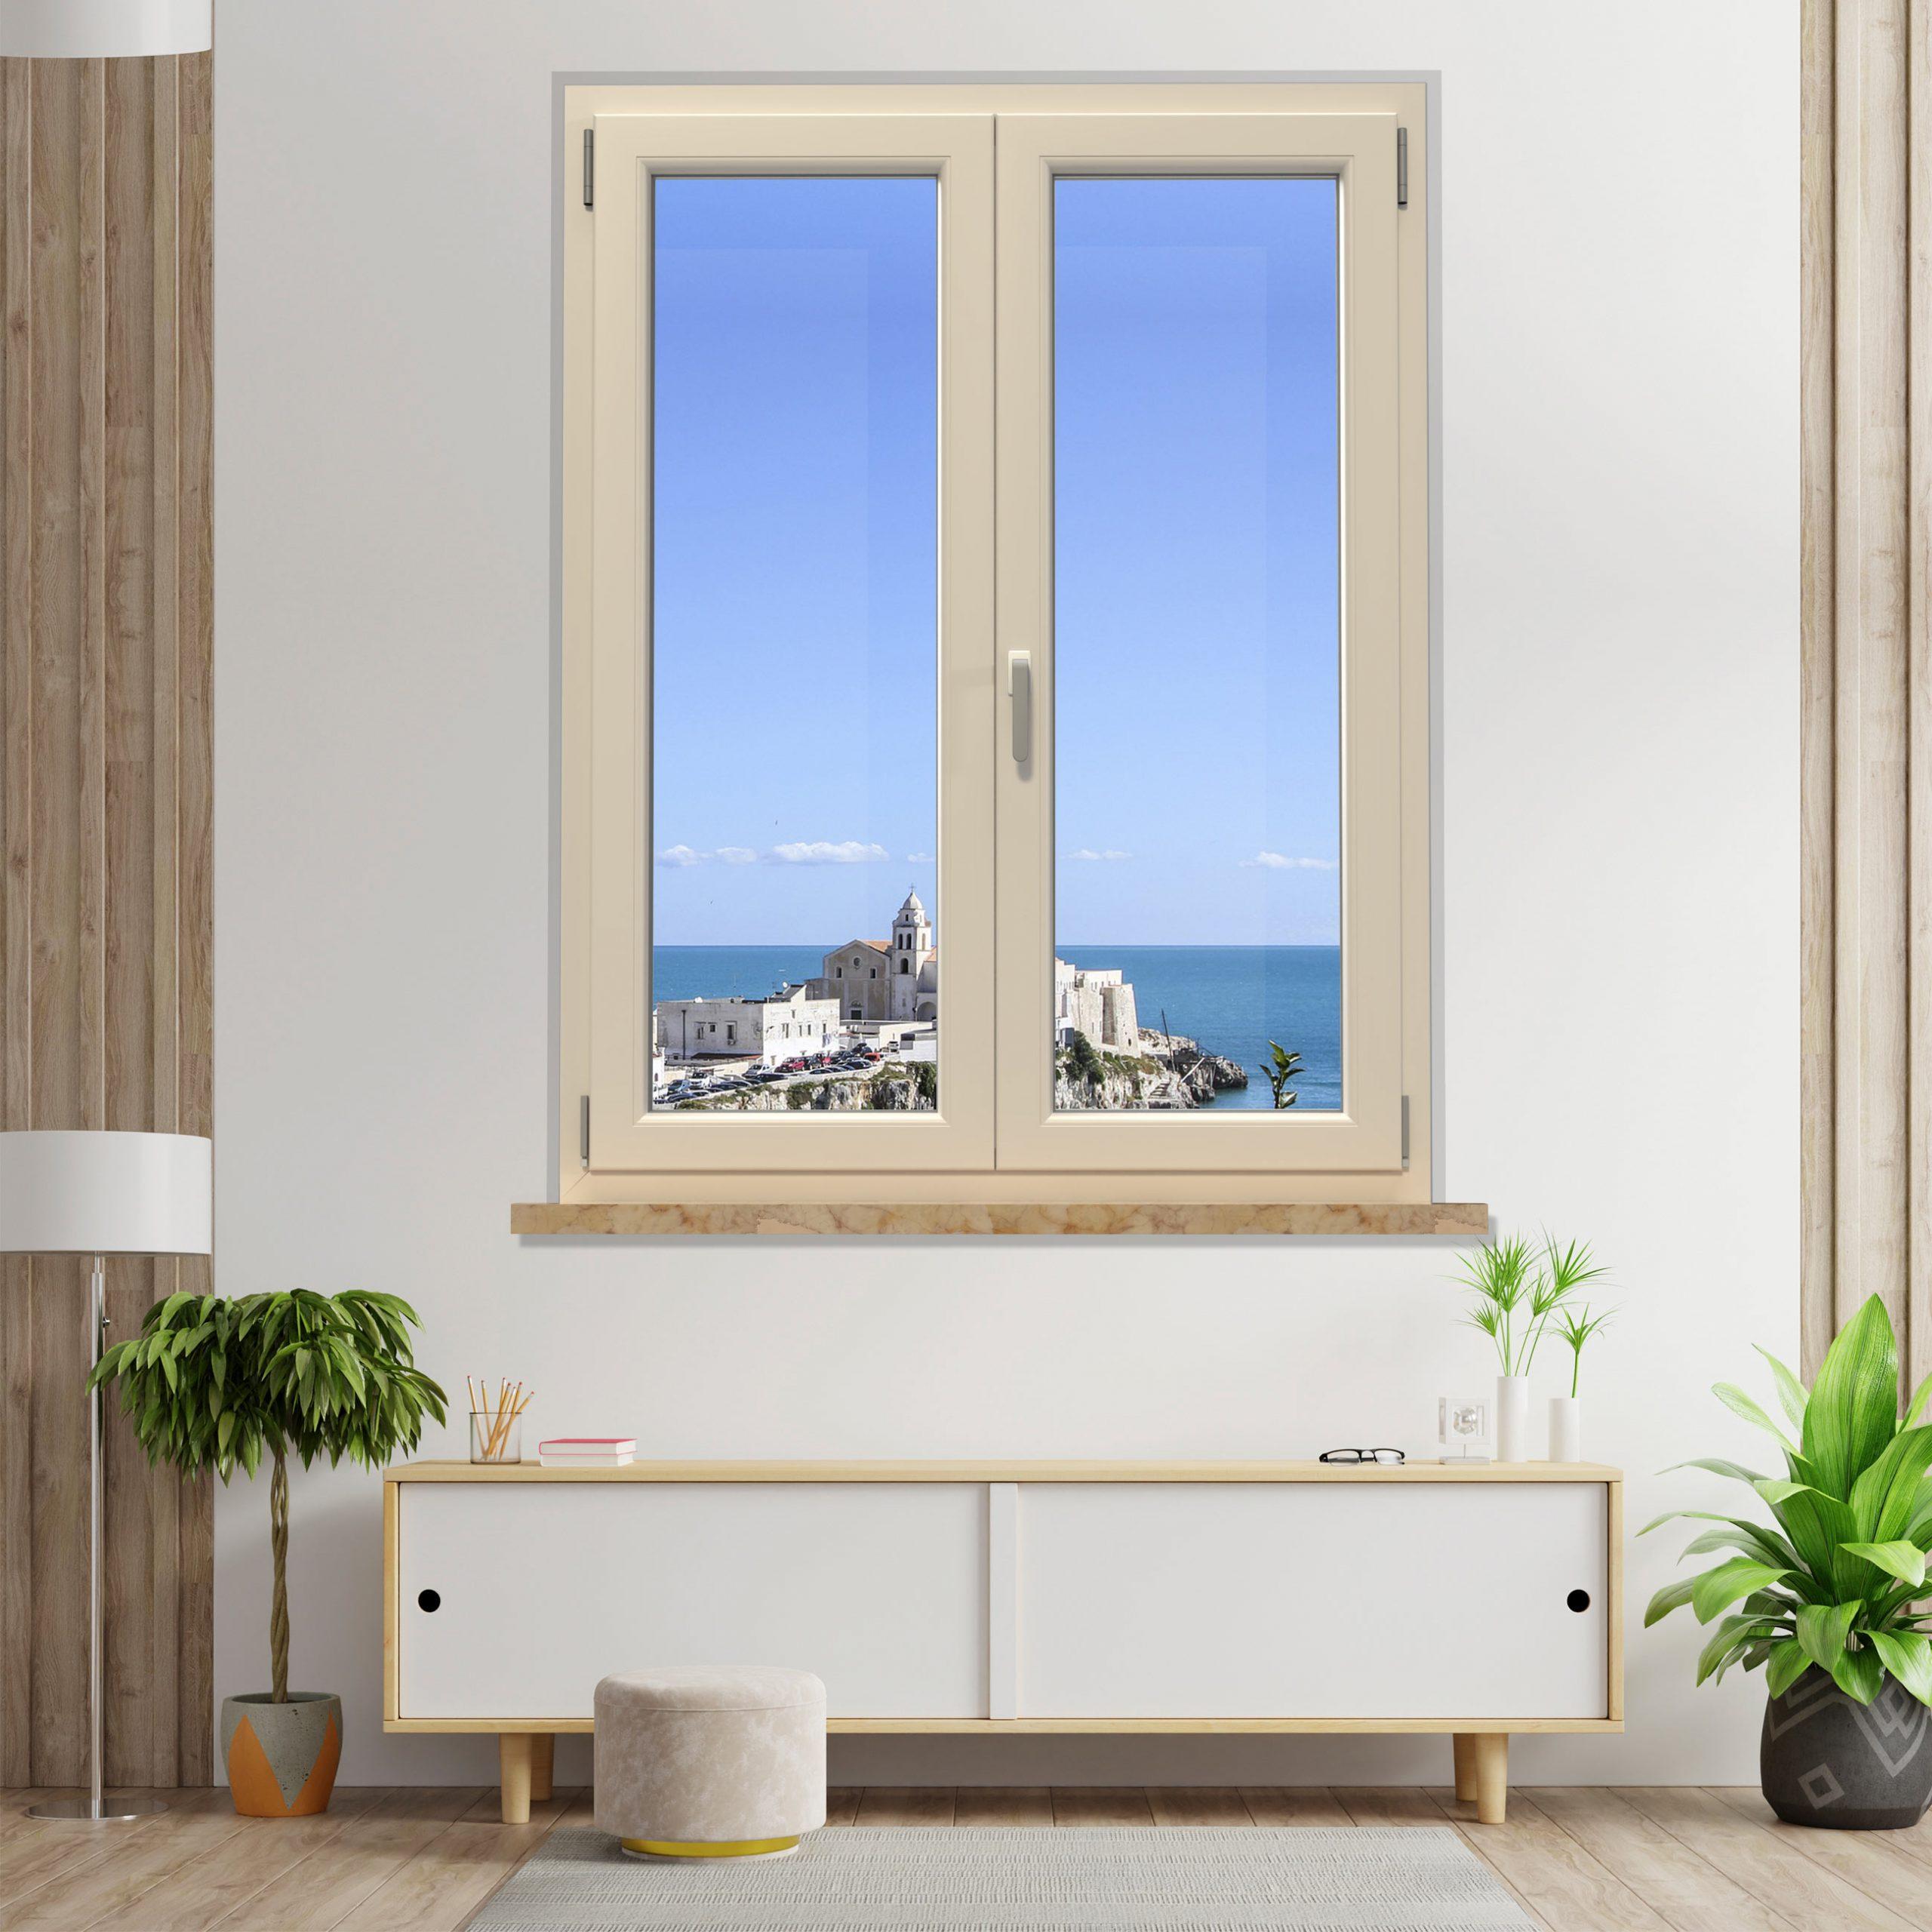 https://www.allpaint.it/wp-content/uploads/2021/07/finestre-ecoline-pvc-allpaint-scaled.jpg